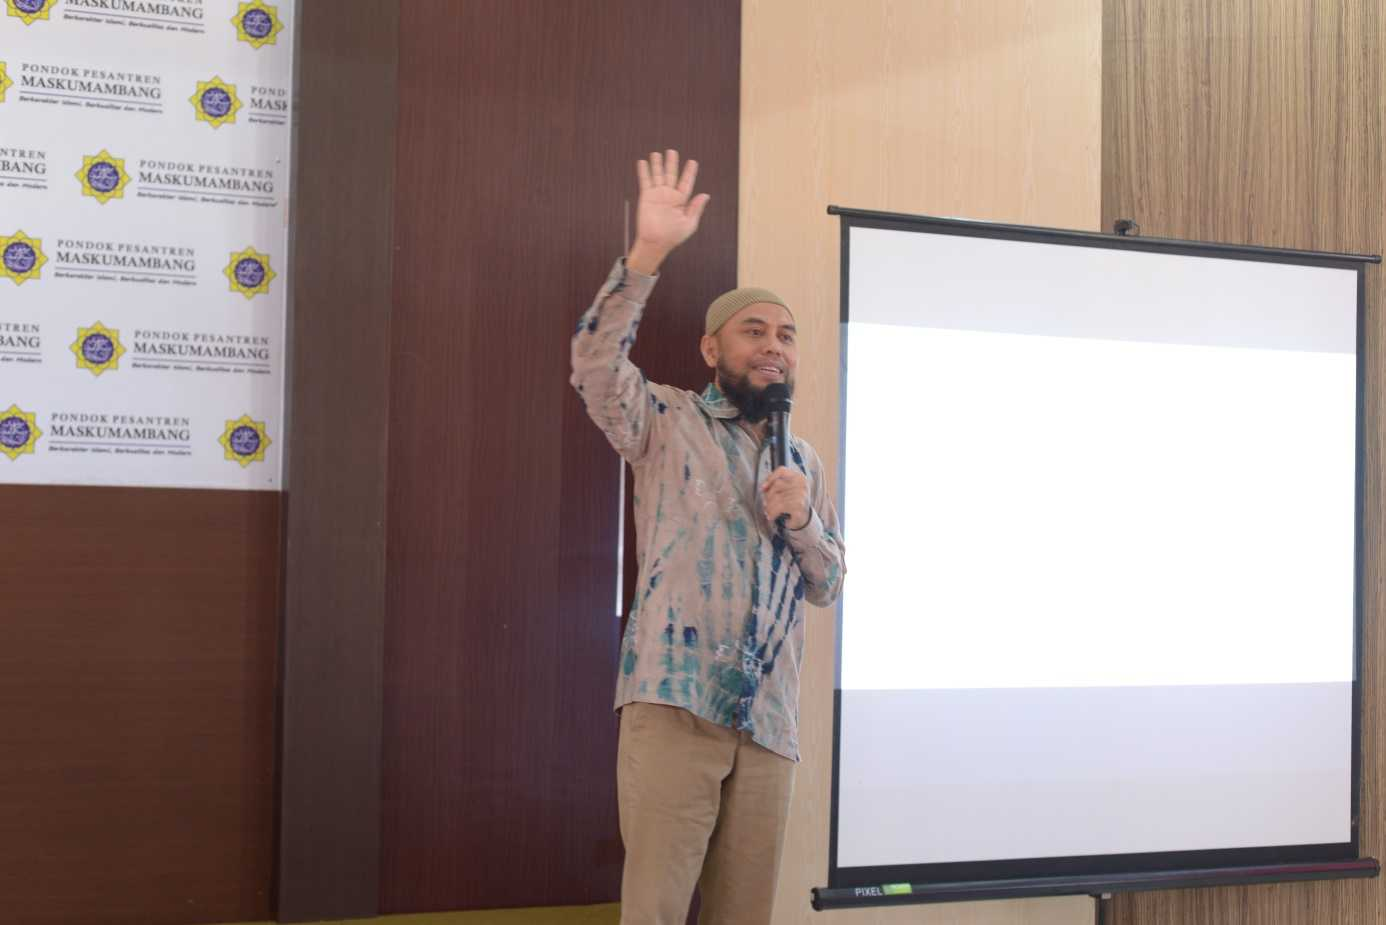 pelatihan SDM Maskumambang